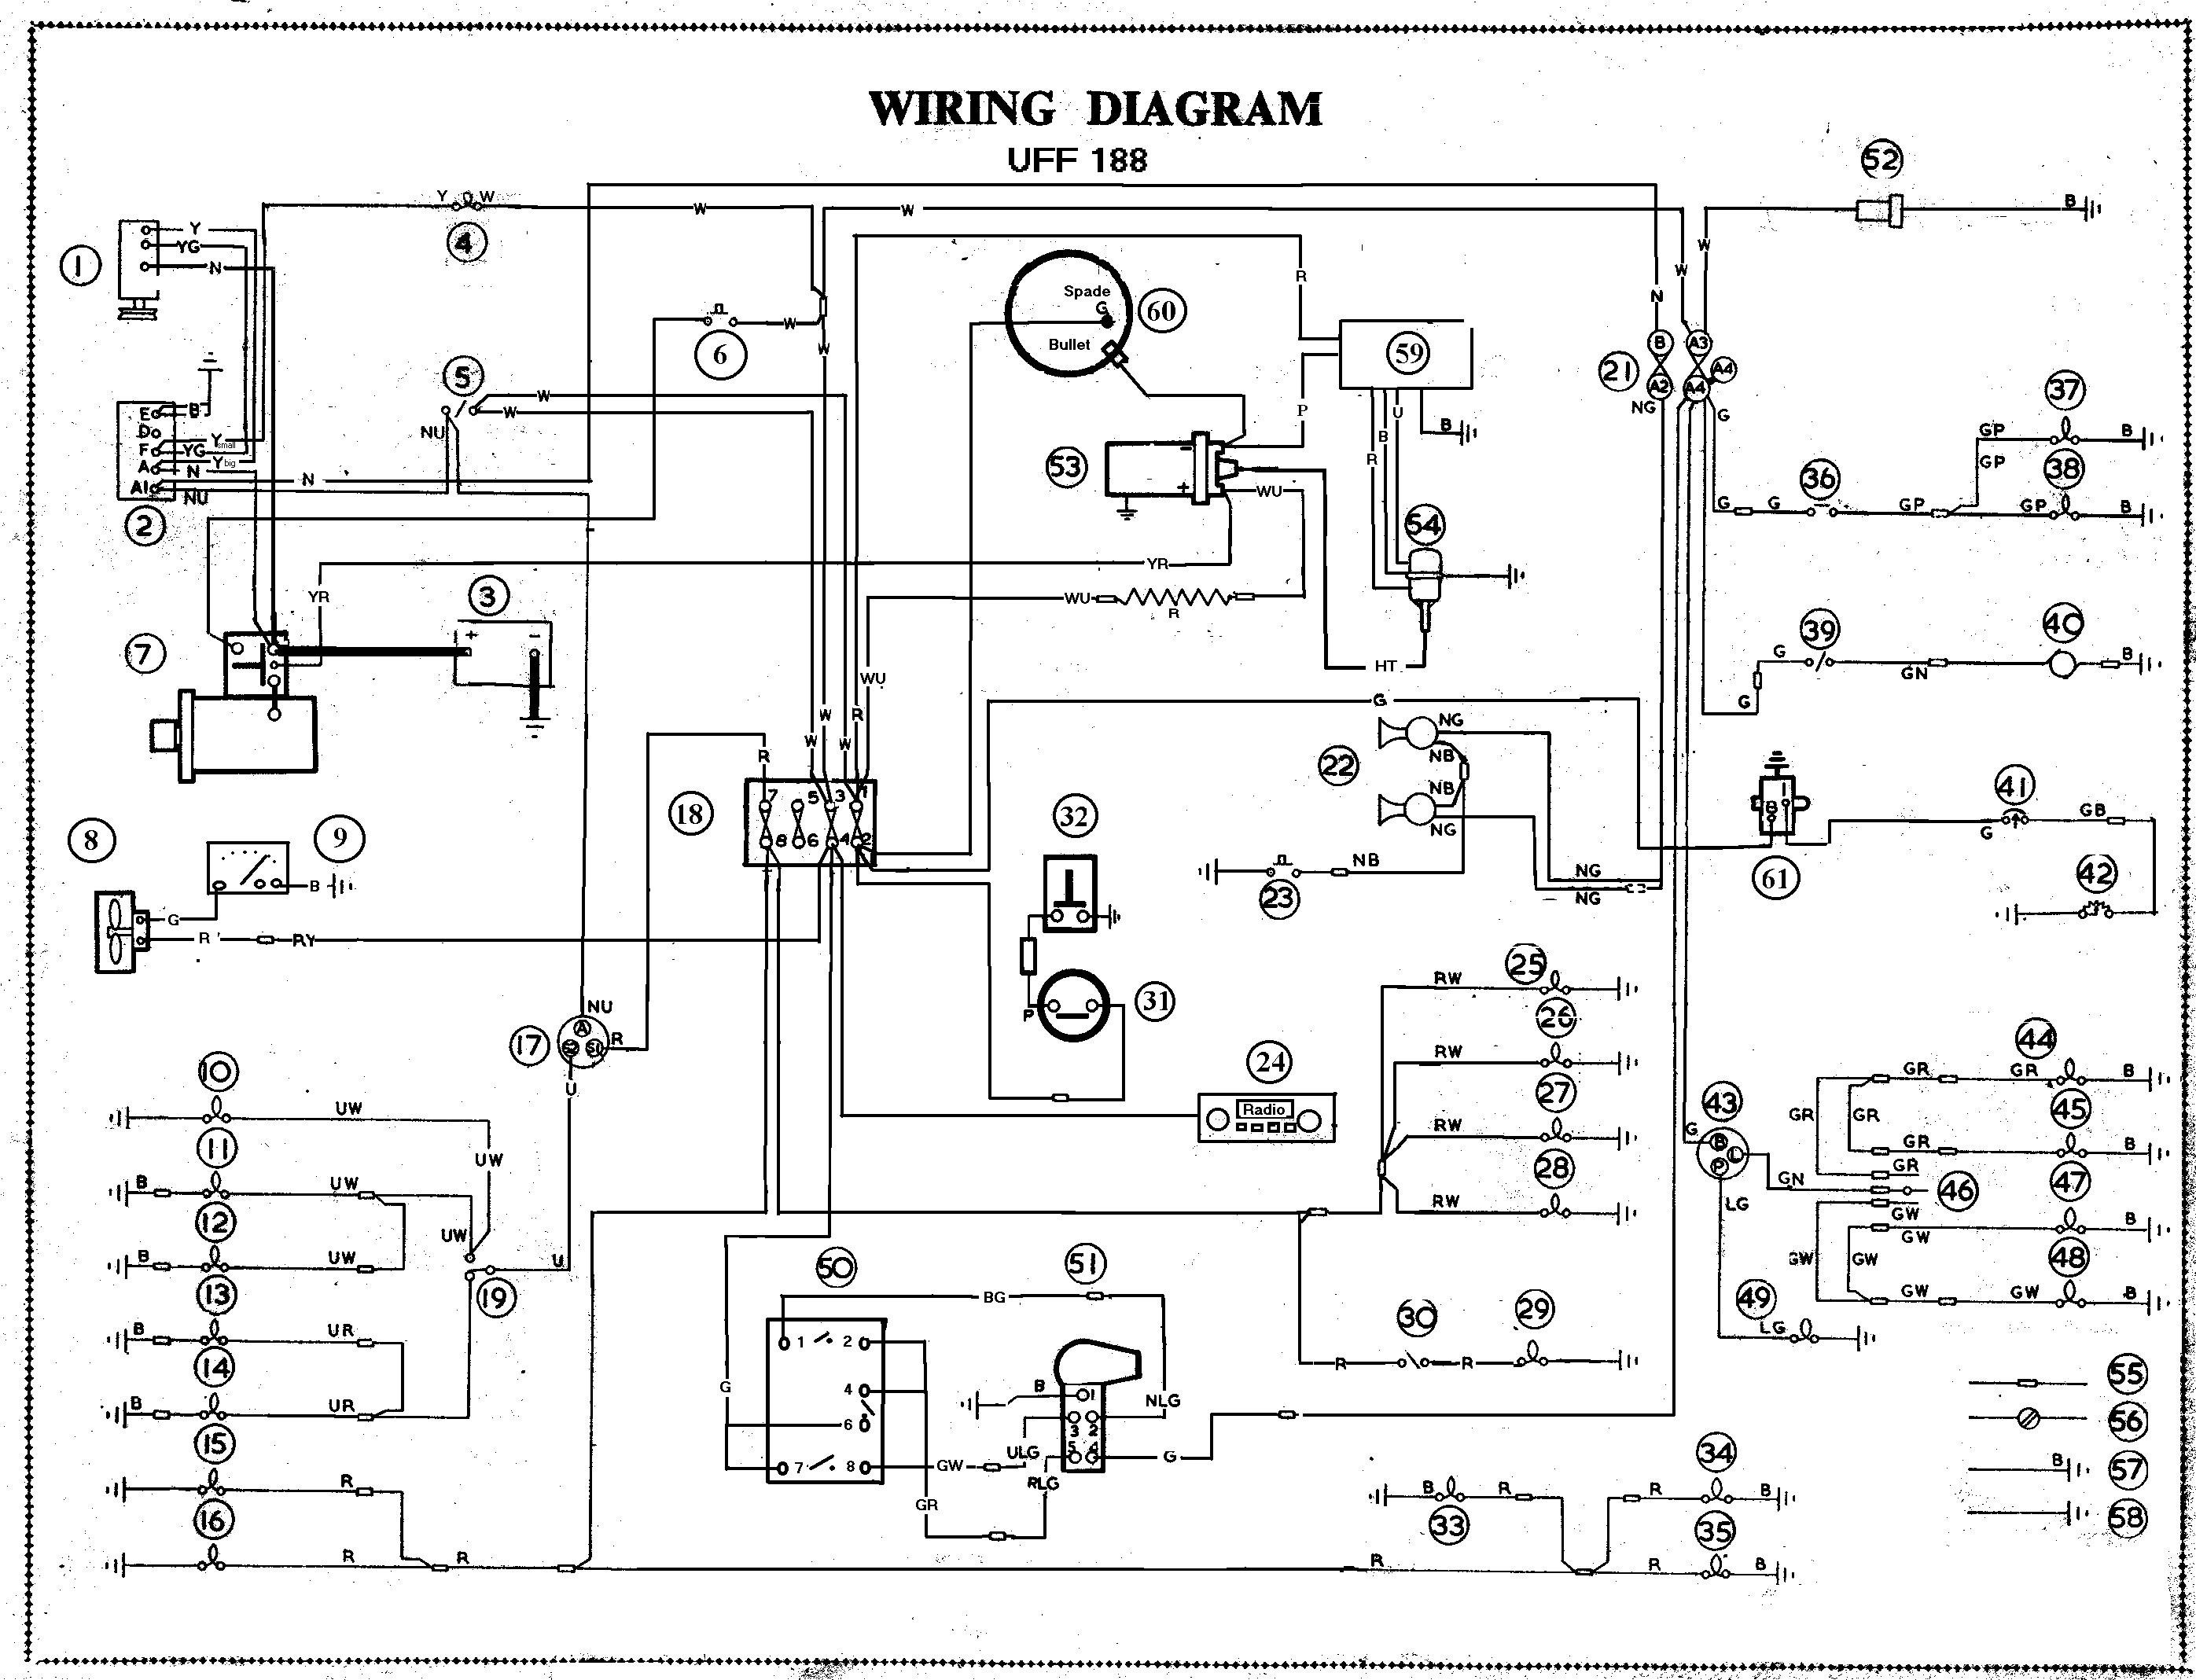 Car Schematic Diagram - Wiring Diagrams Hubs - Automobile Wiring Diagram